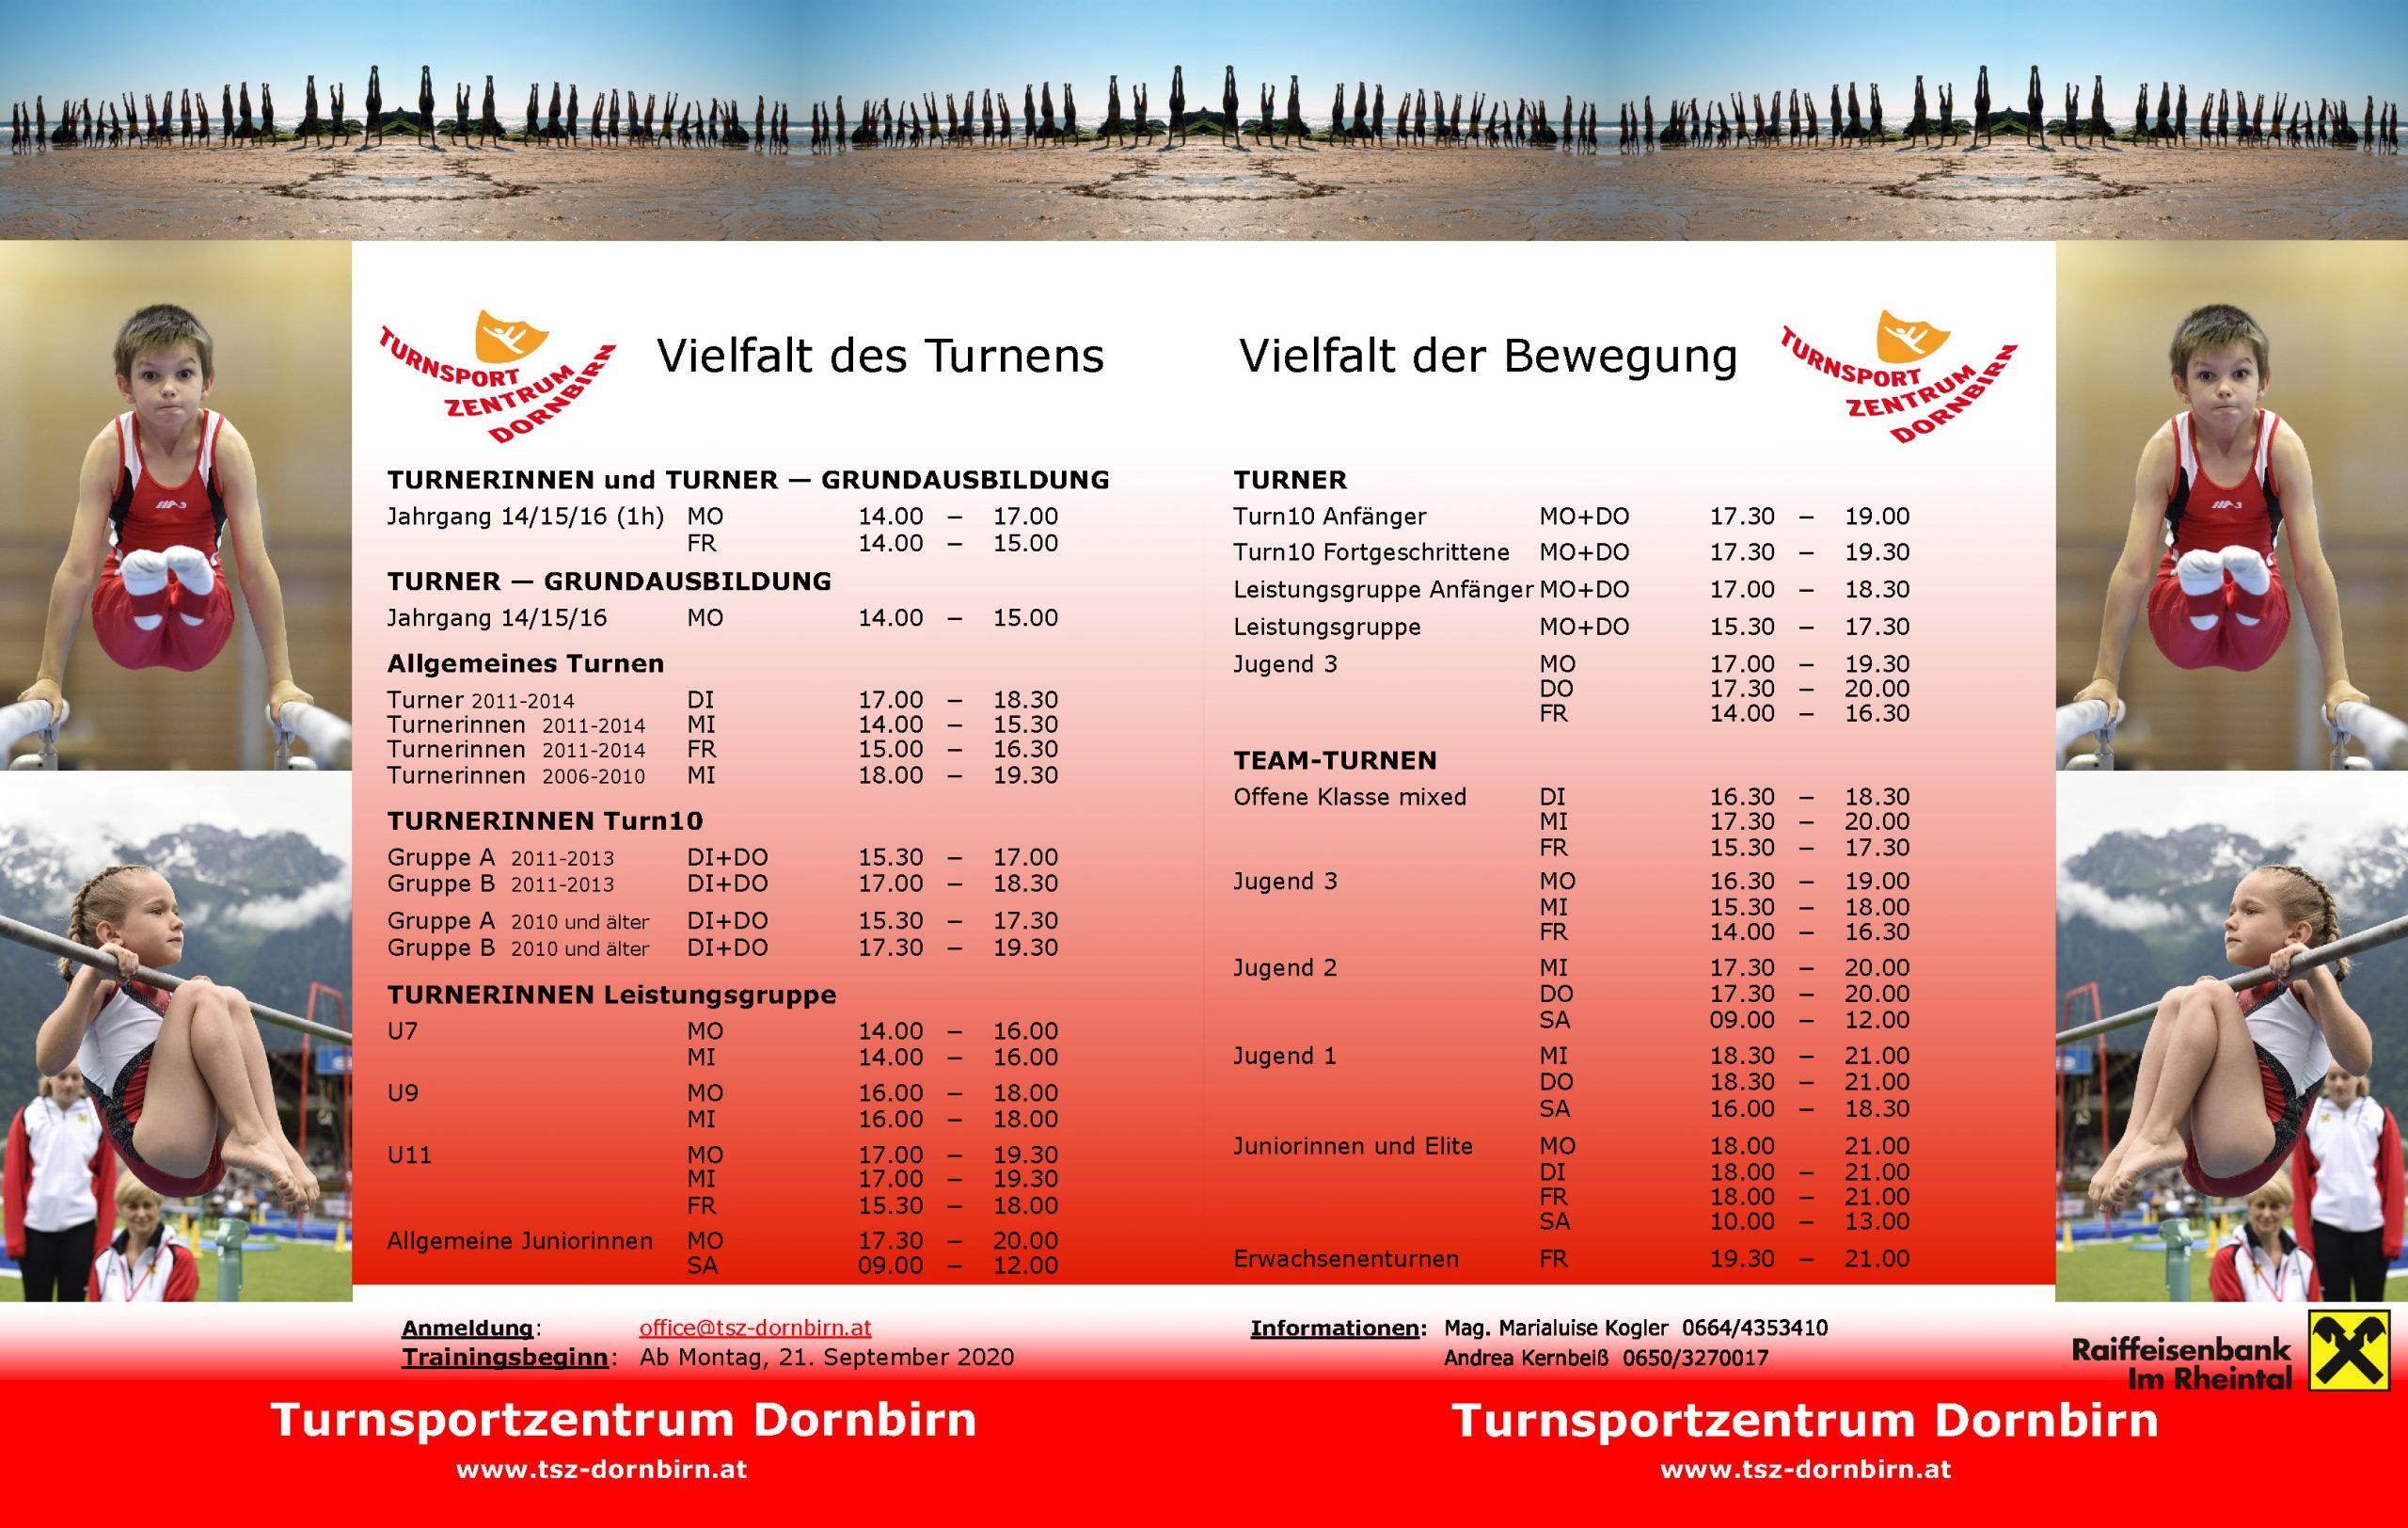 Turnsportzentrum Dornbirn 2020 2021